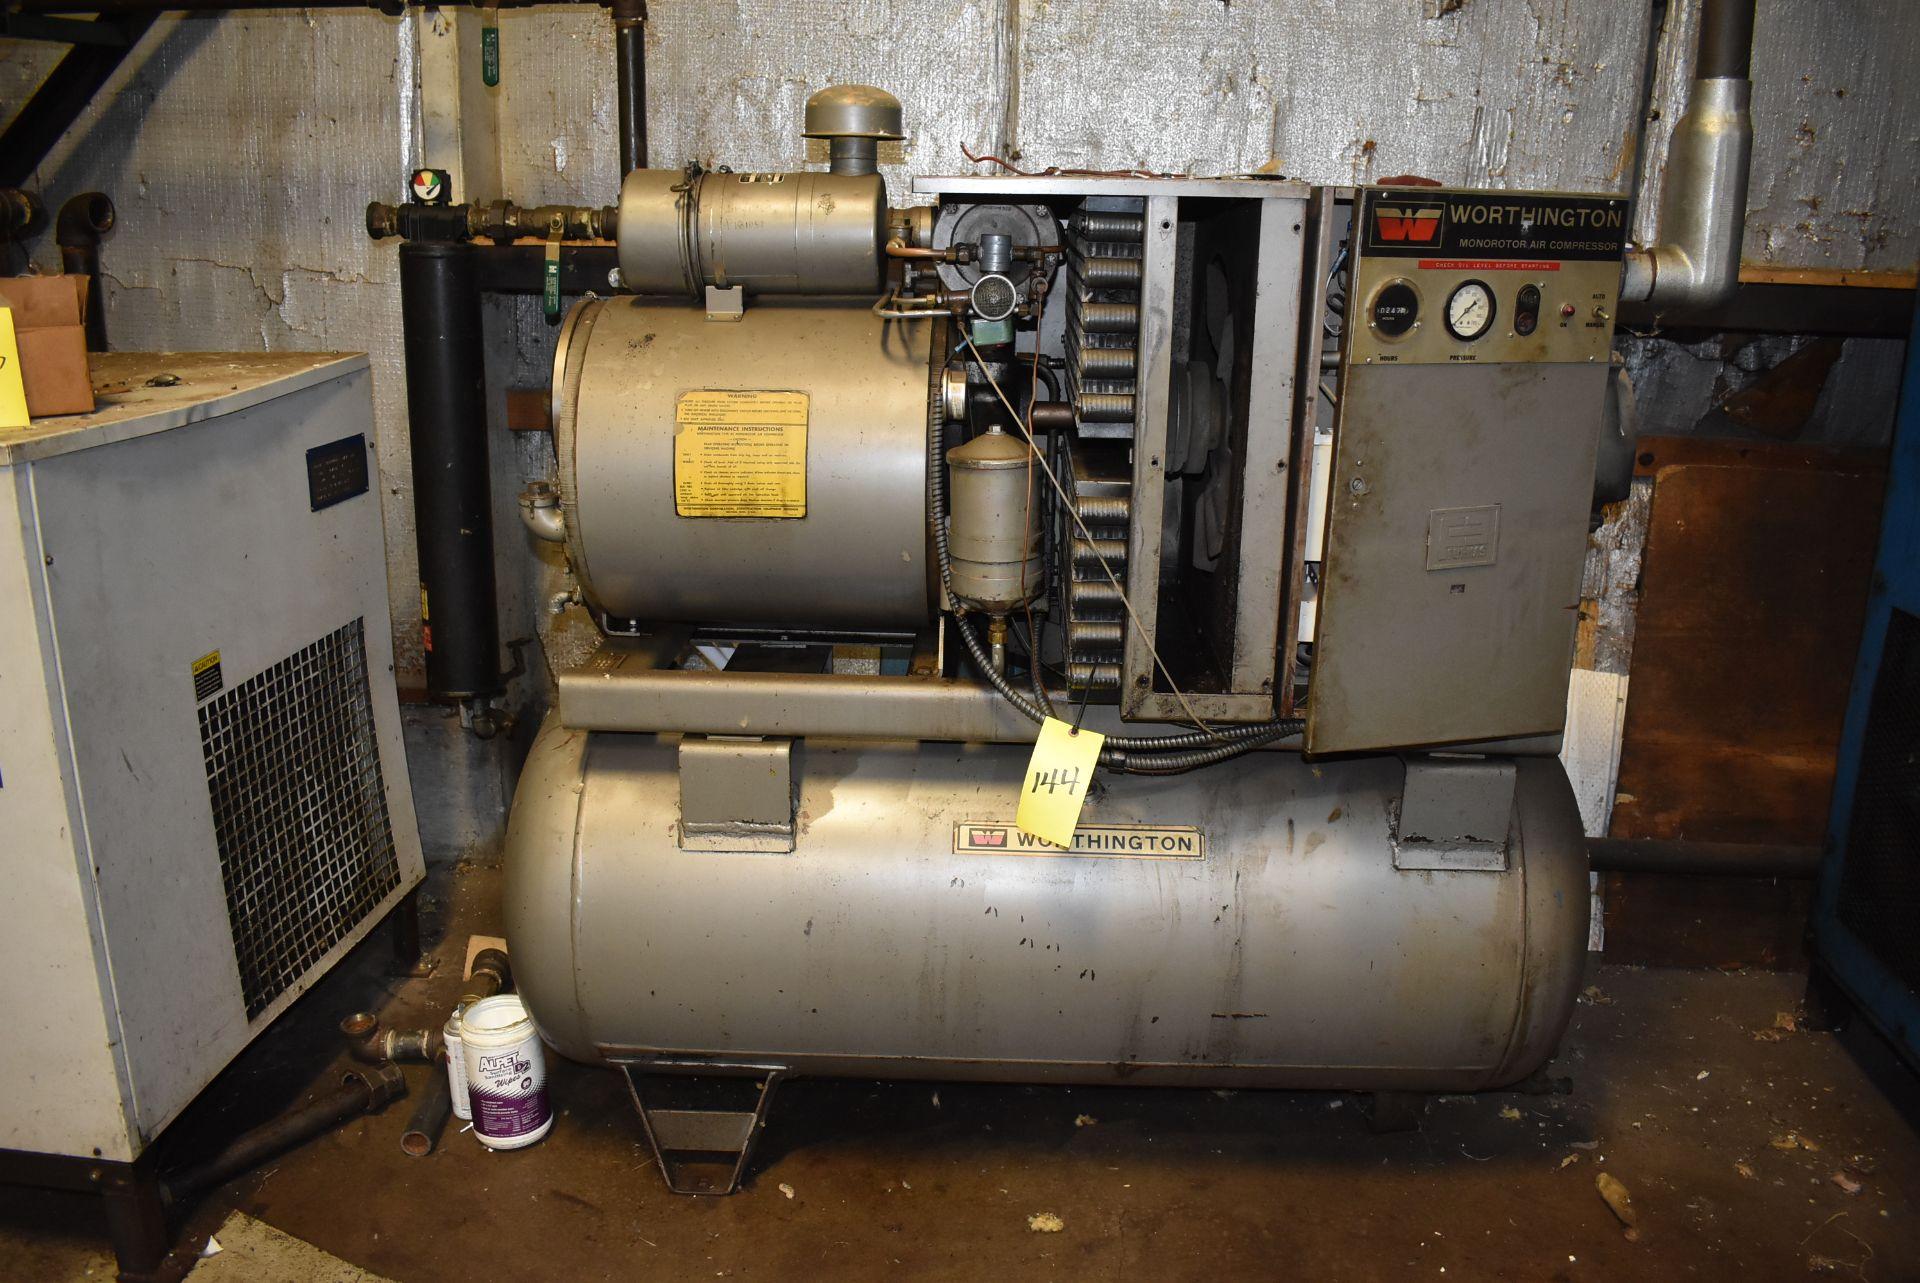 Worthington 30 HP Monoroto Air Compressor